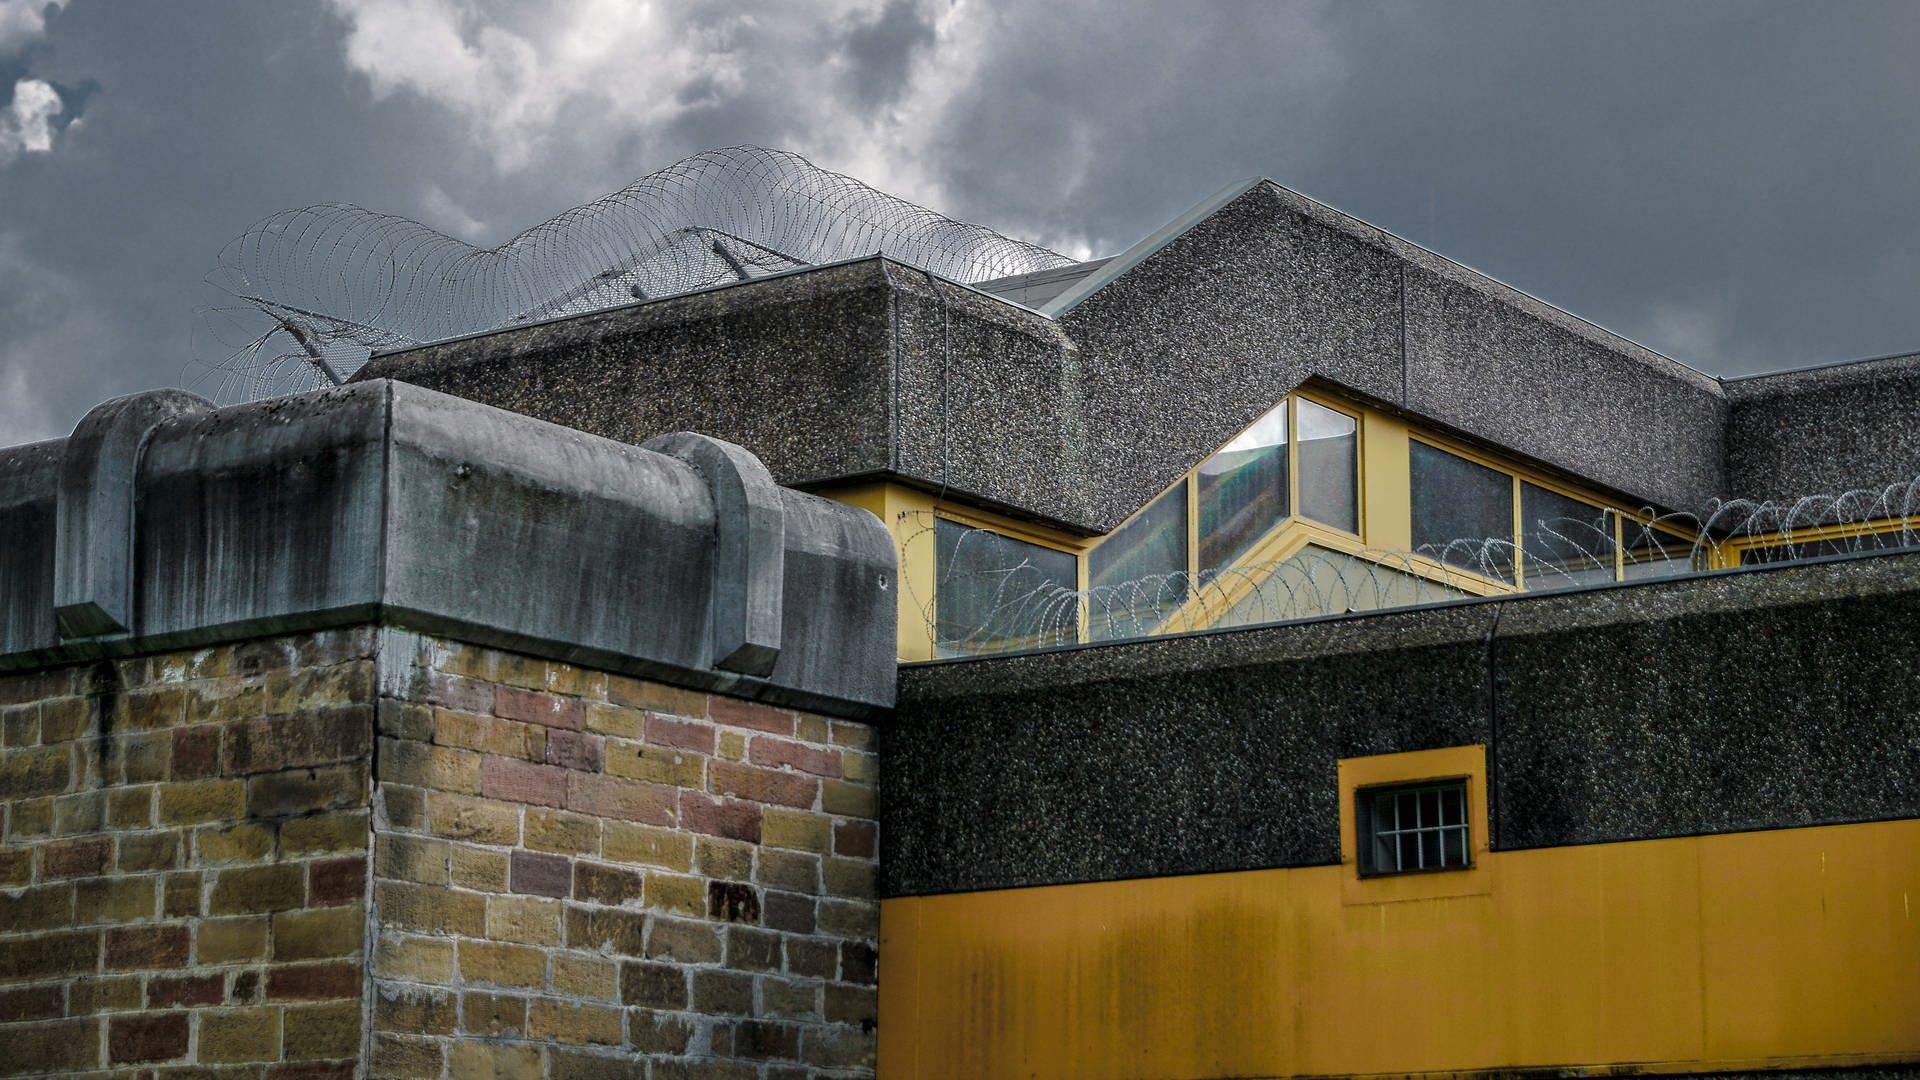 Nach Schmuggelskandal Neuer Gefängnisleiter gesucht Heilbronn SWR Aktuell Baden Württemberg SWR Aktuell